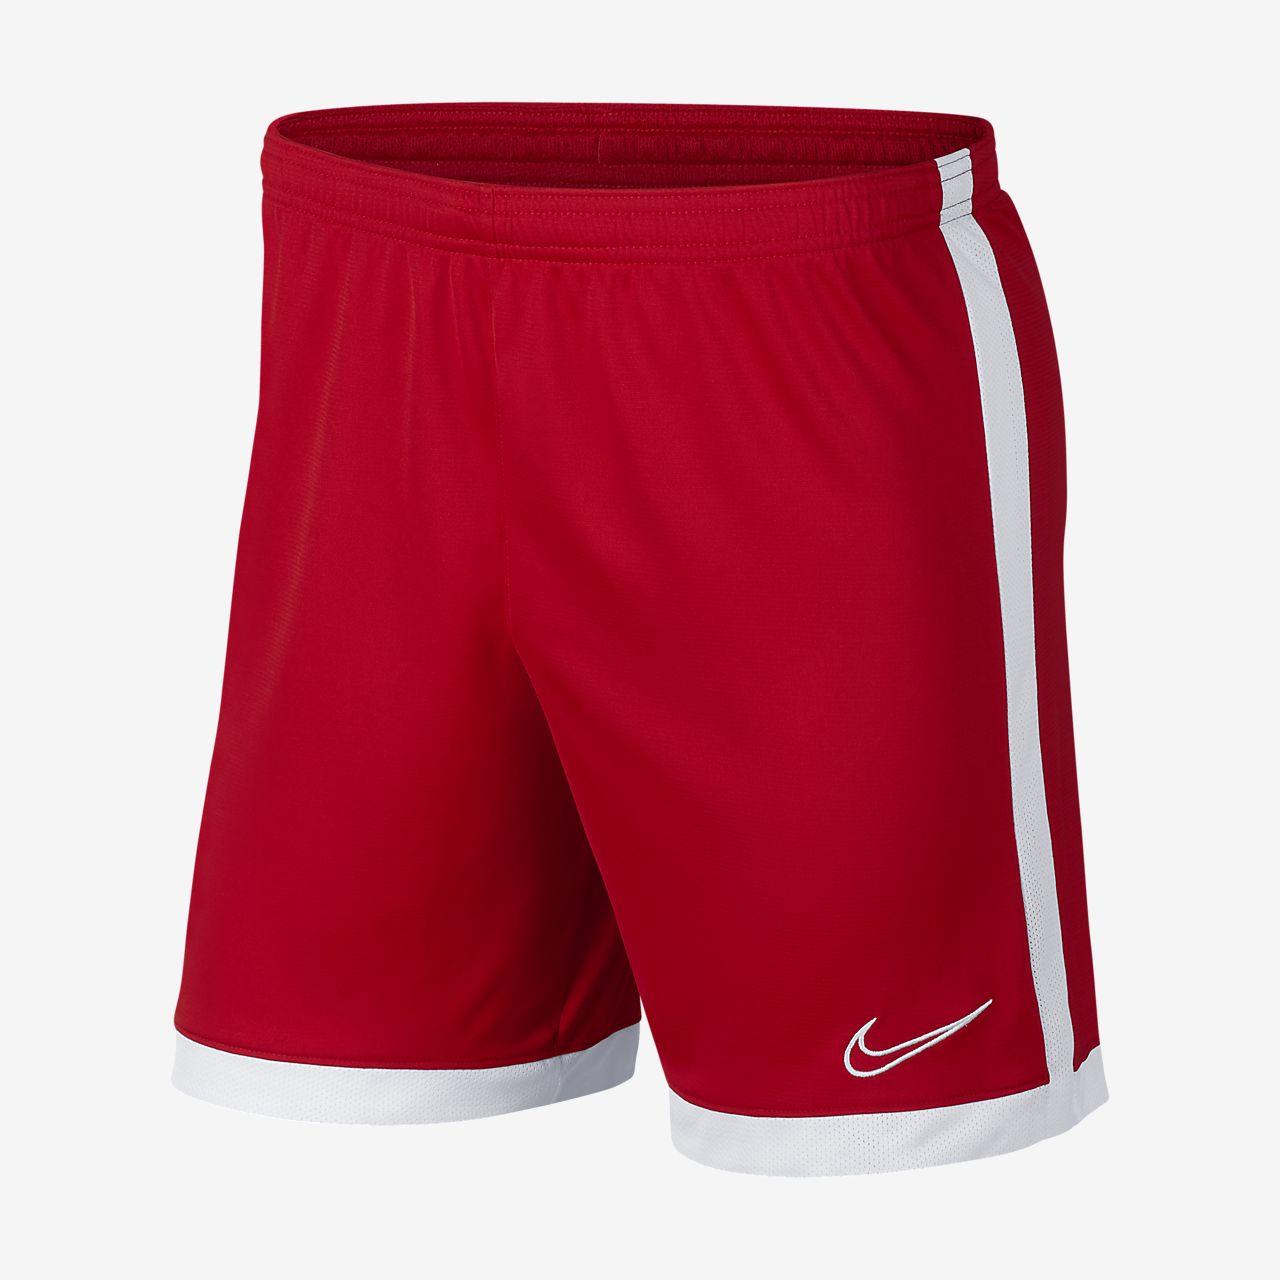 super popular a0274 3c52c Men s Football Shorts. Nike Dri-FIT Academy